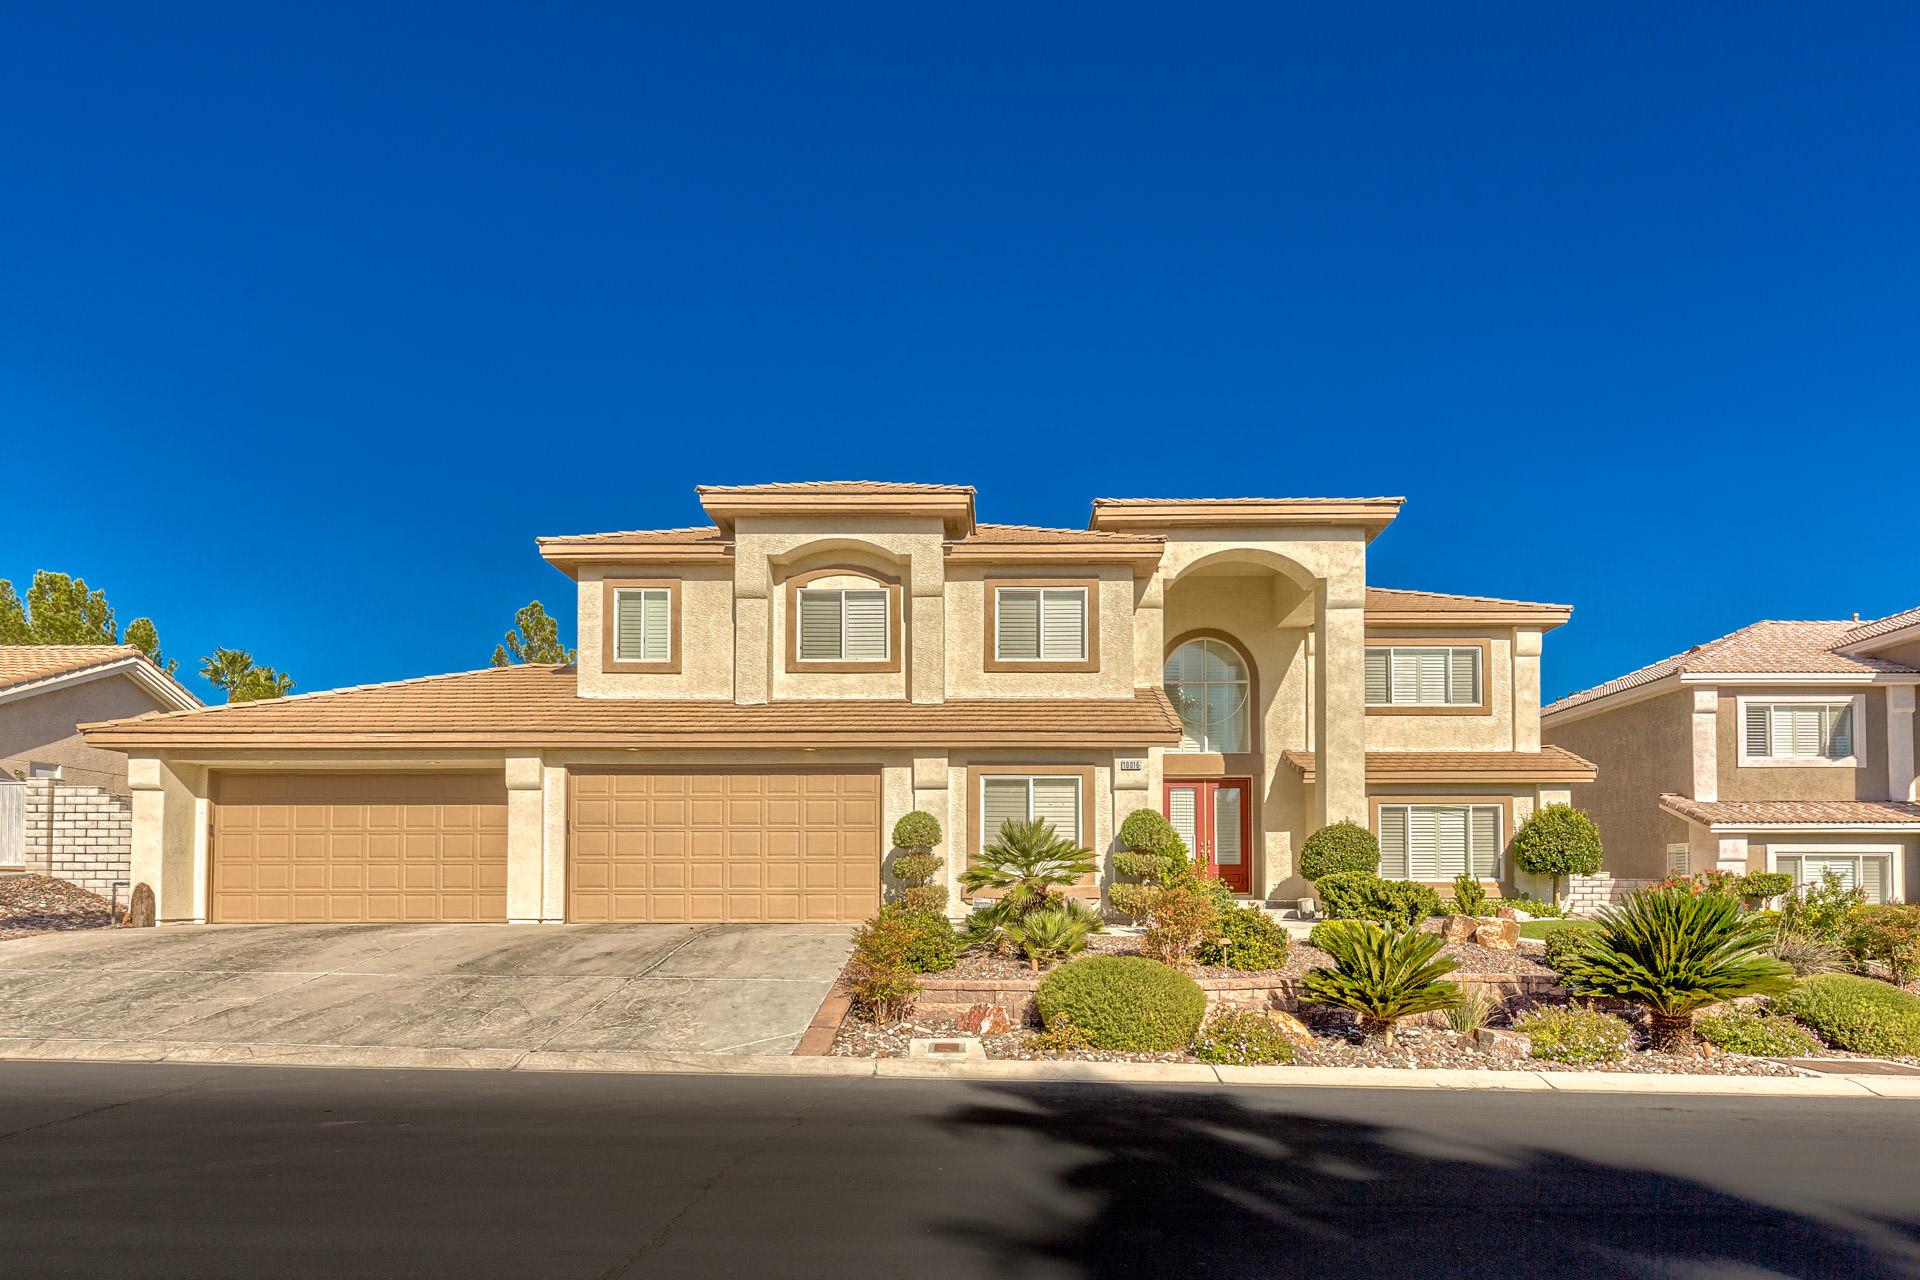 Homes for sale in las vegas - Homes For Sale In Las Vegas 54